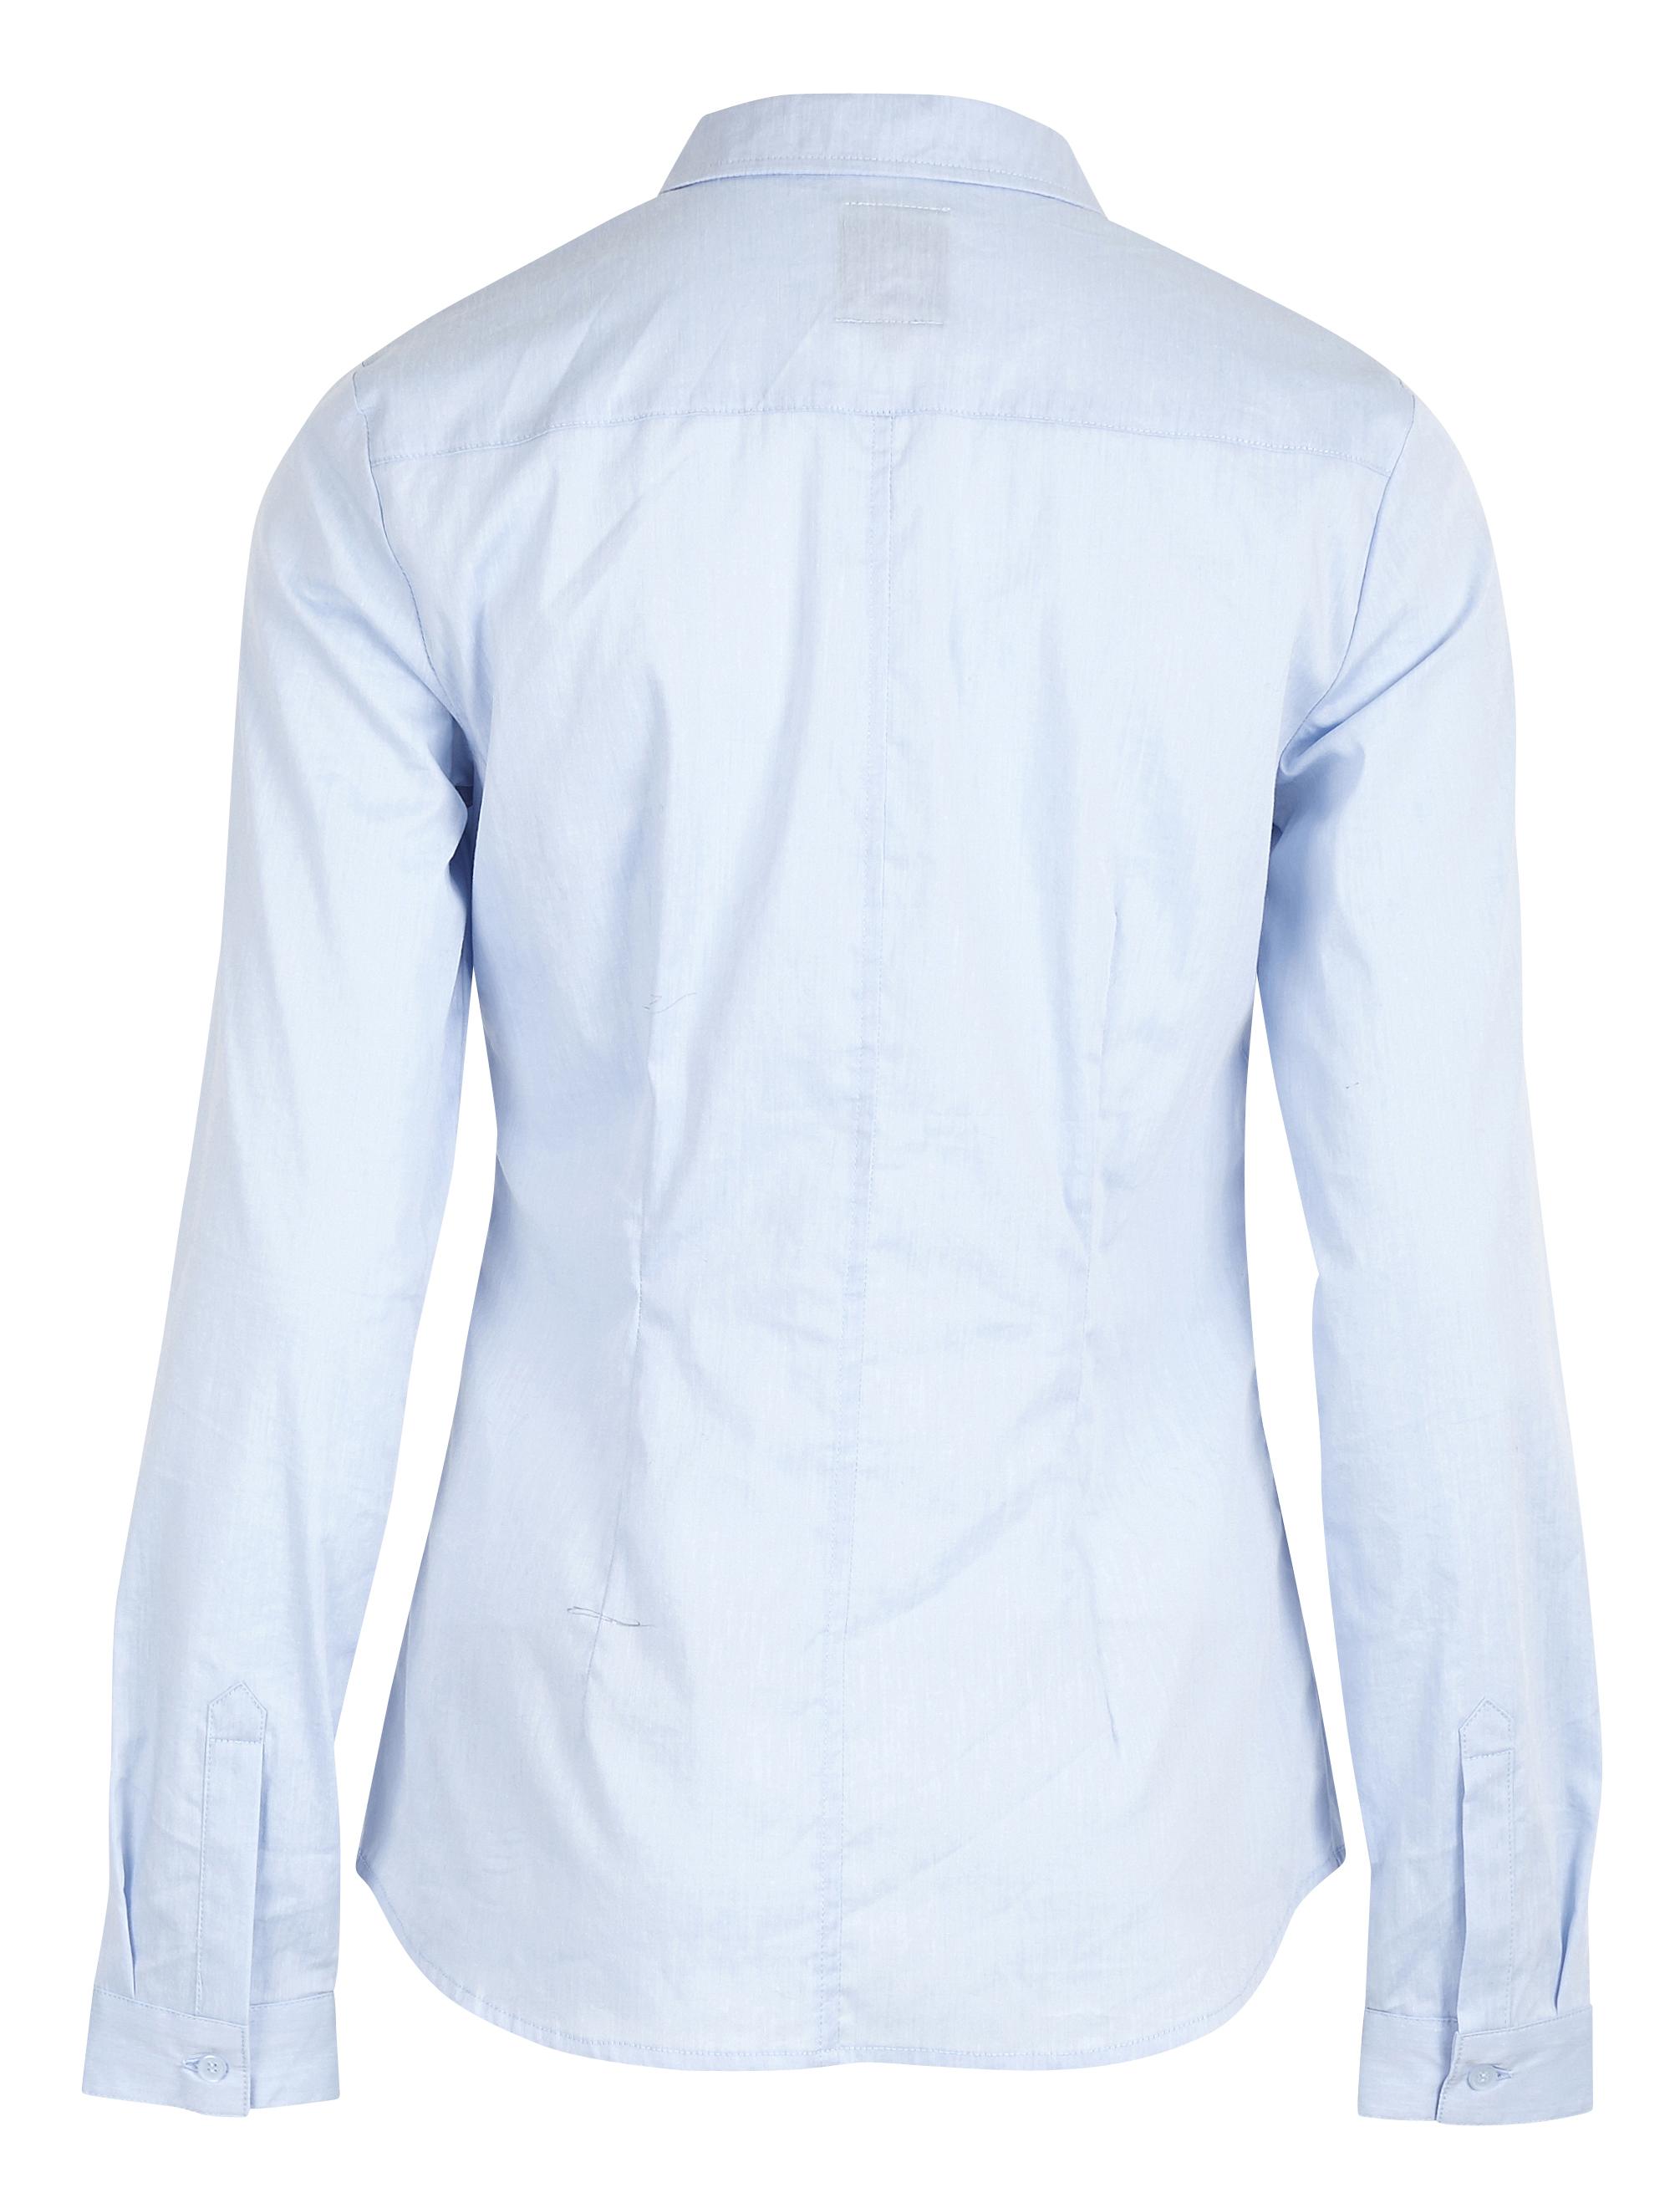 Kentucky Blue Langærmet skjorte – Køb Kentucky Blue Langærmet skjorte fra str. 34-44 her